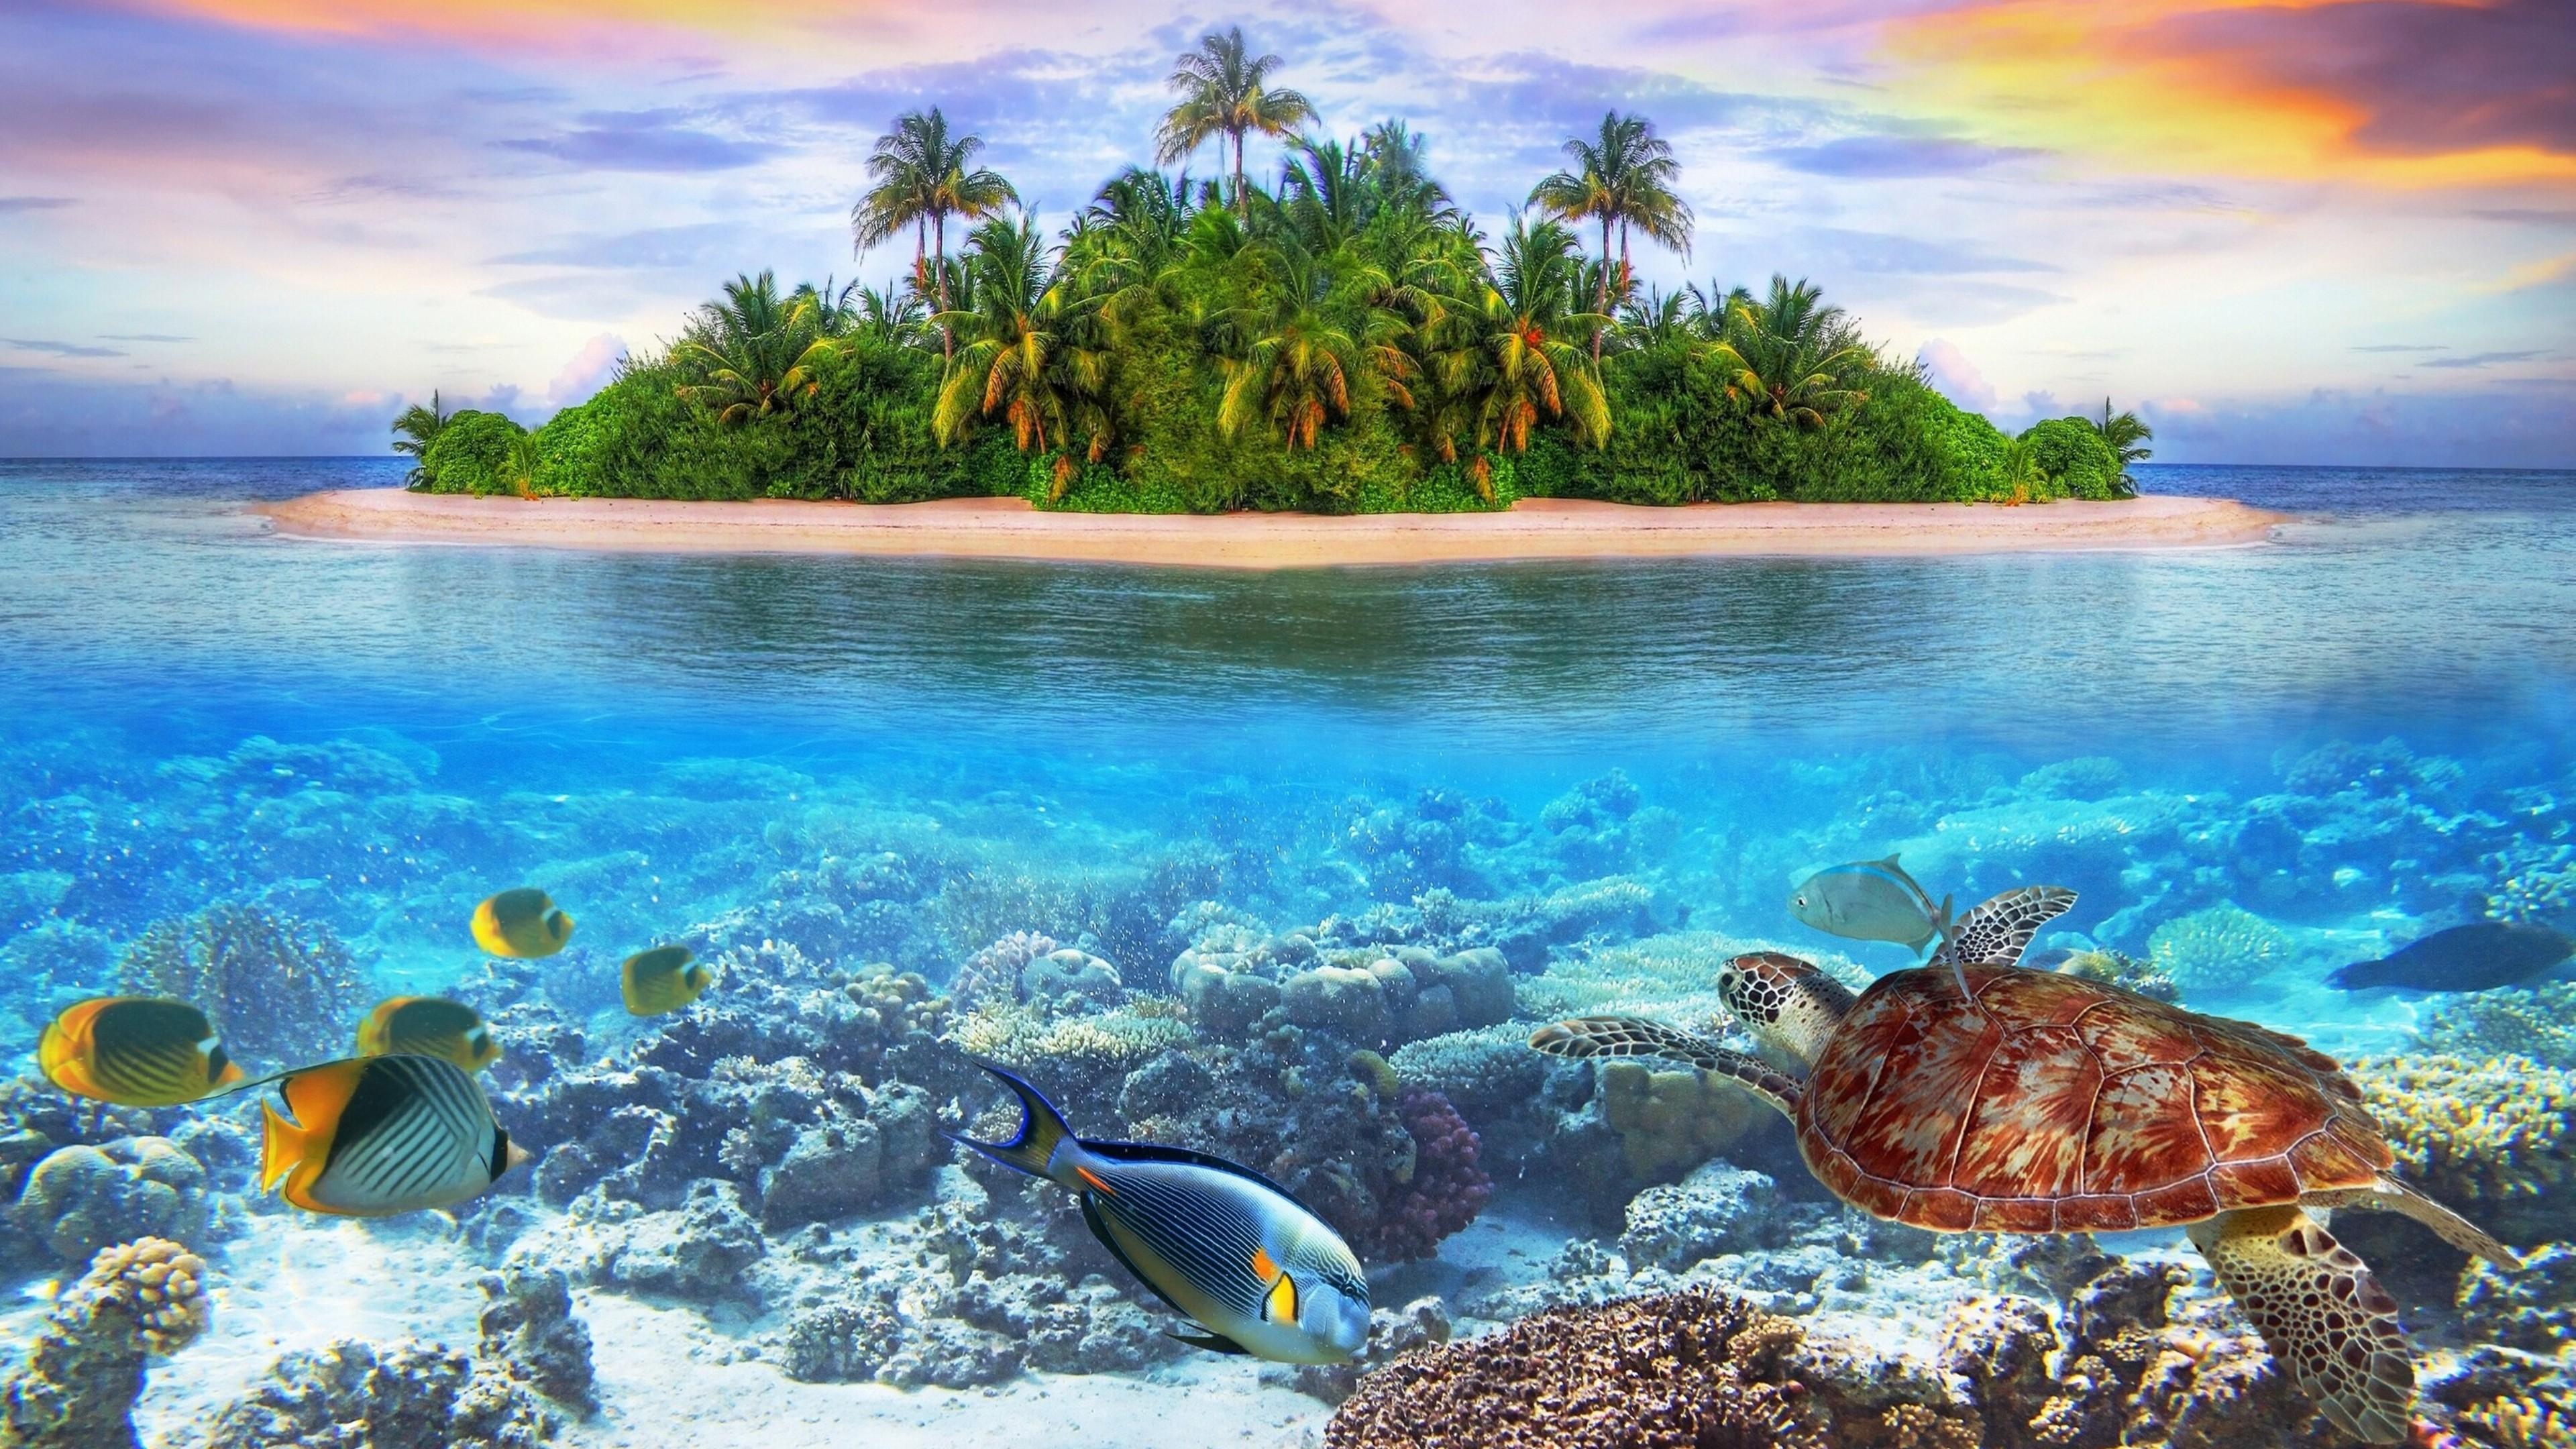 Underwater 4k Ultra Hd Wallpaper Background Image 3840x2160 Id